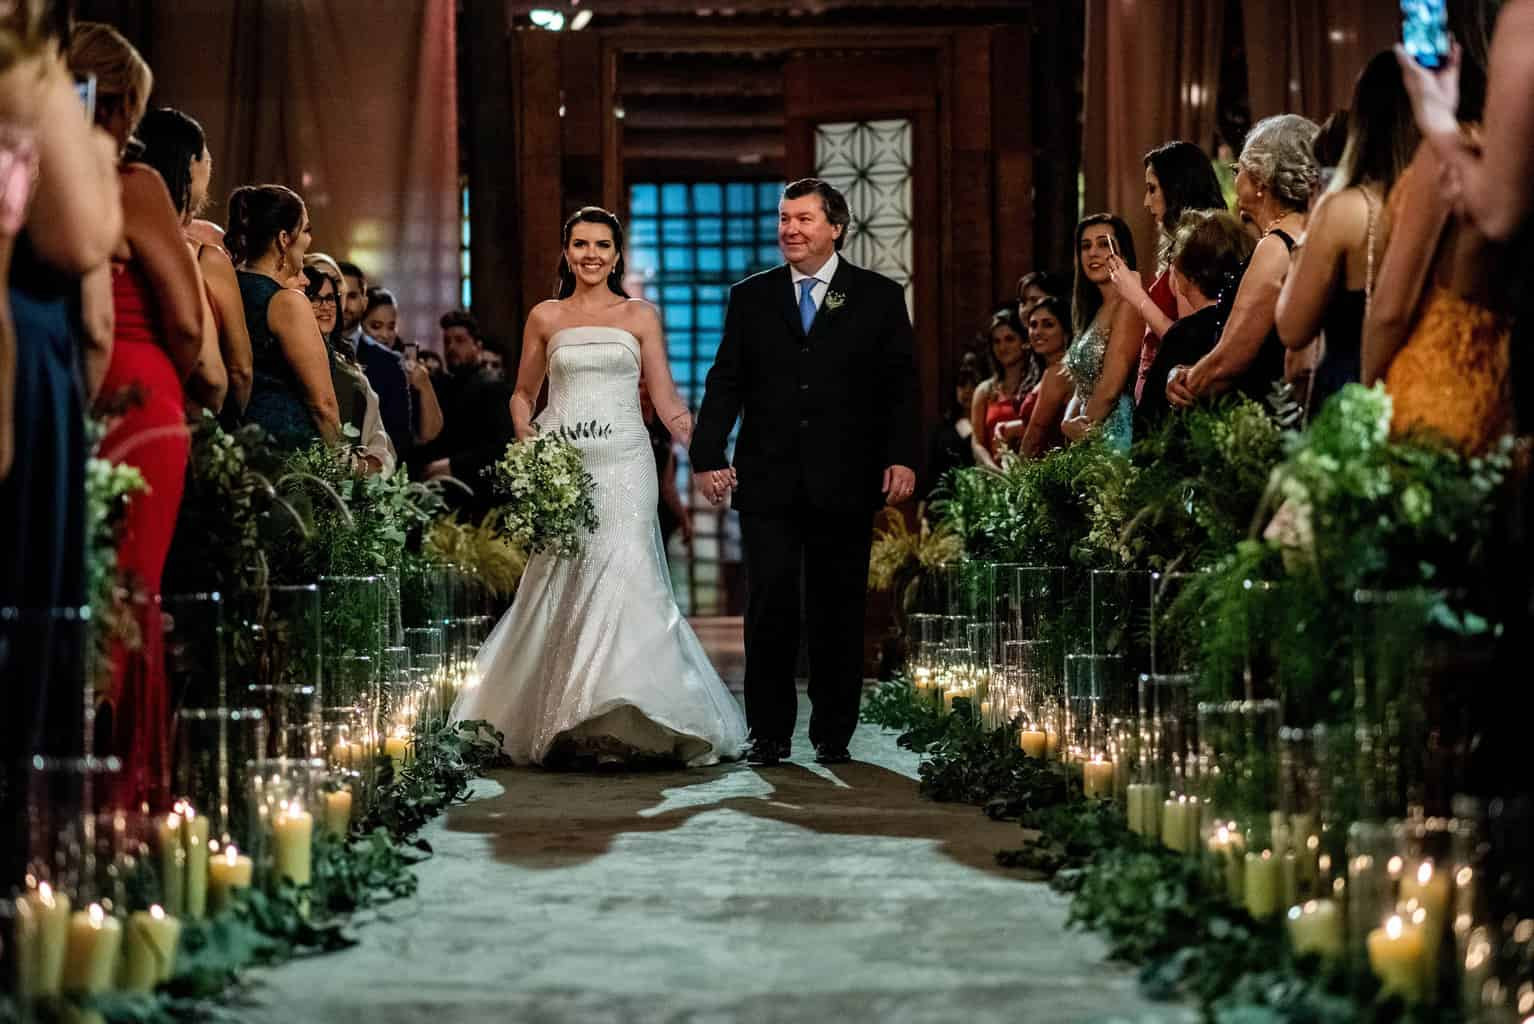 Bel-Benkler-eventos-Casamento-Ariane-e-Matheus-cerimonia-decoracao-contemporanea-fotografia-Rafael-Bigarelli-noivos-na-pista-Spazio-Giardini-65